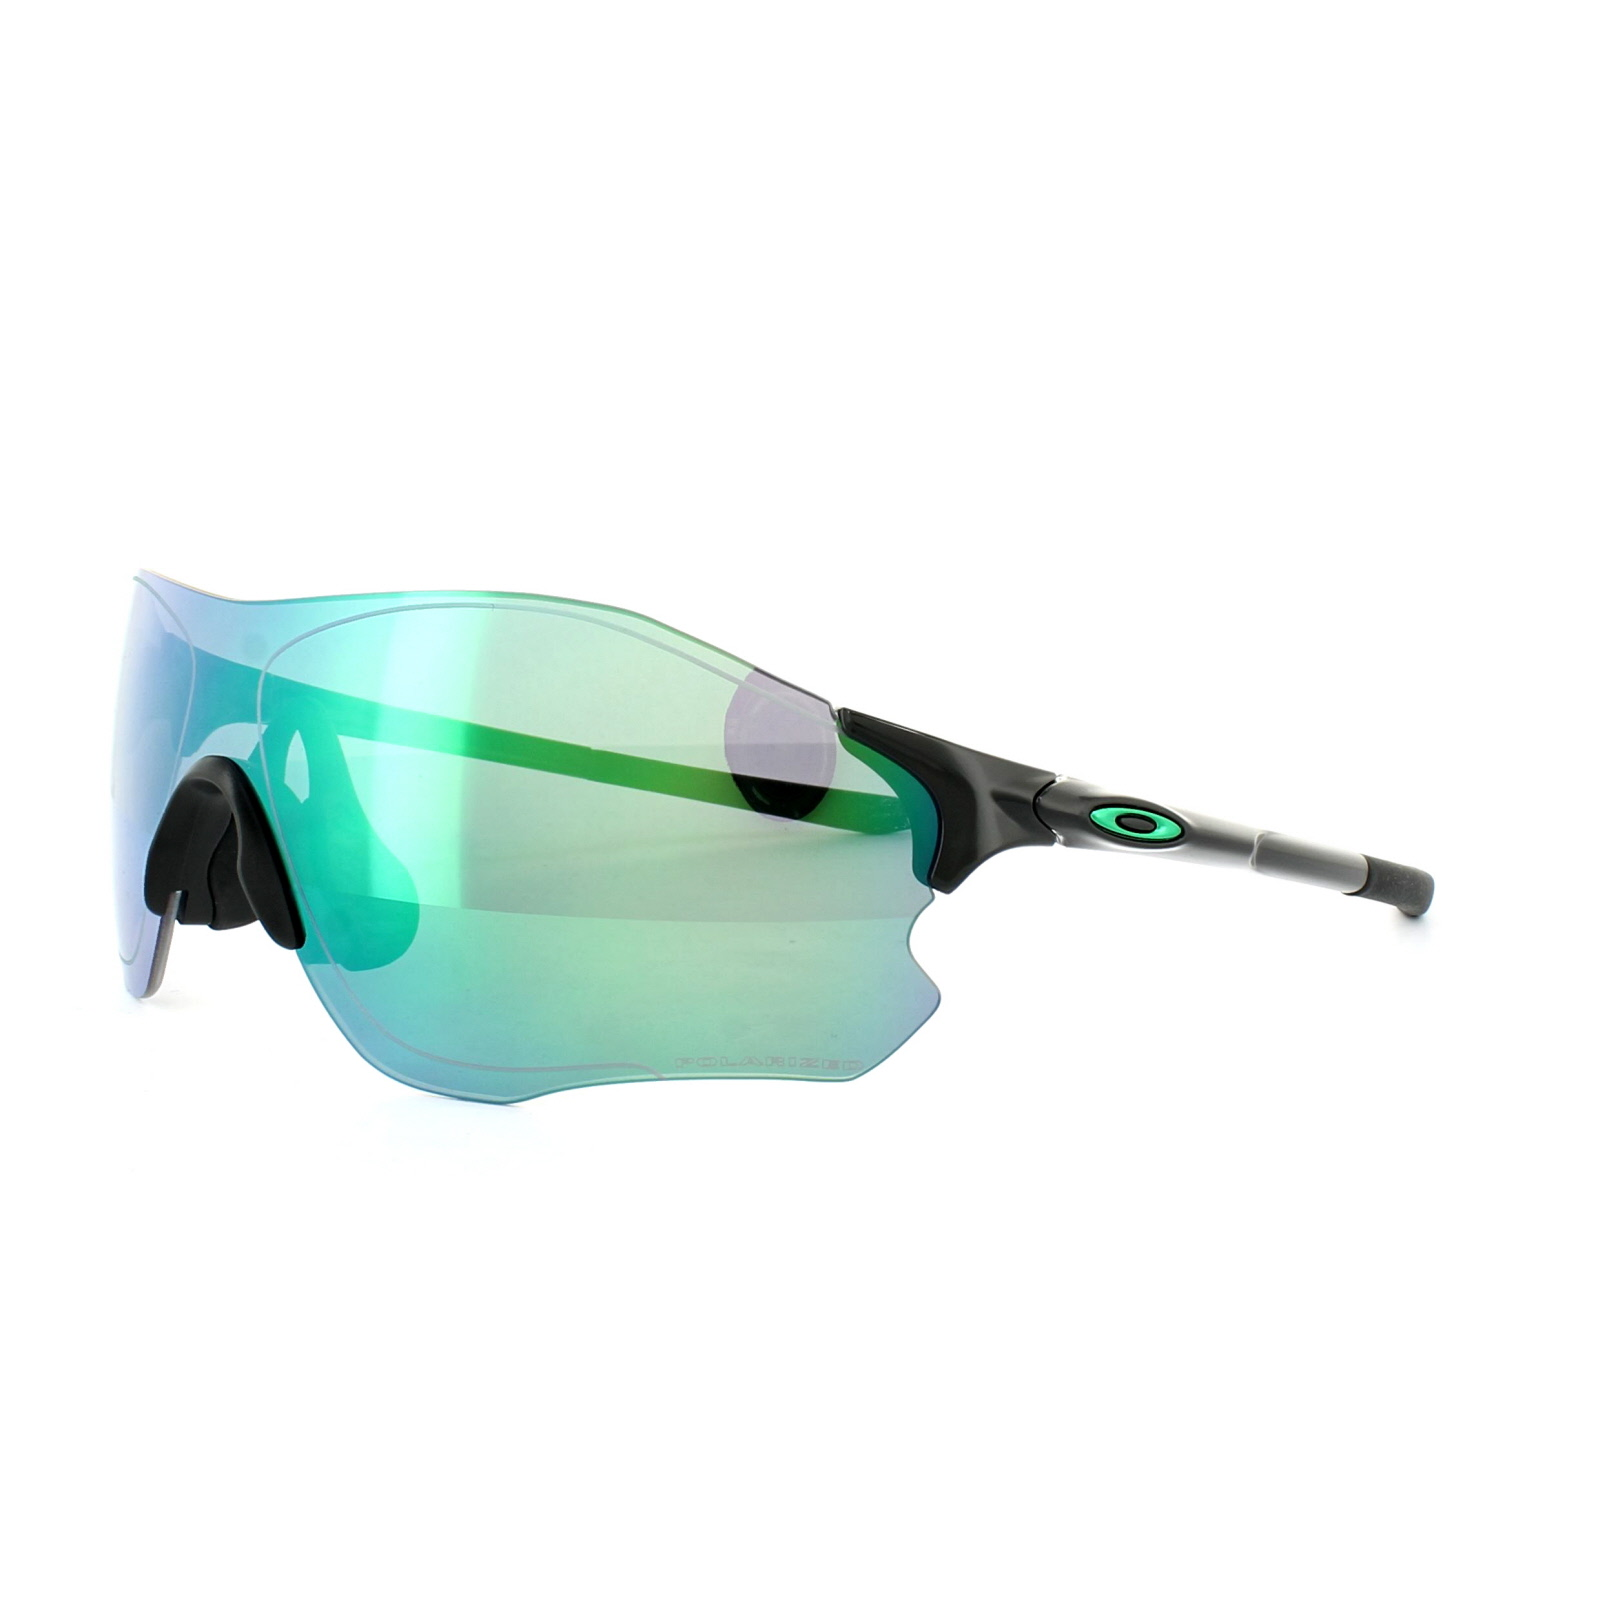 1a9da7201fd Sentinel Oakley Sunglasses EVZero Path OO9308-08 Polished Black Jade  Iridium Polarized